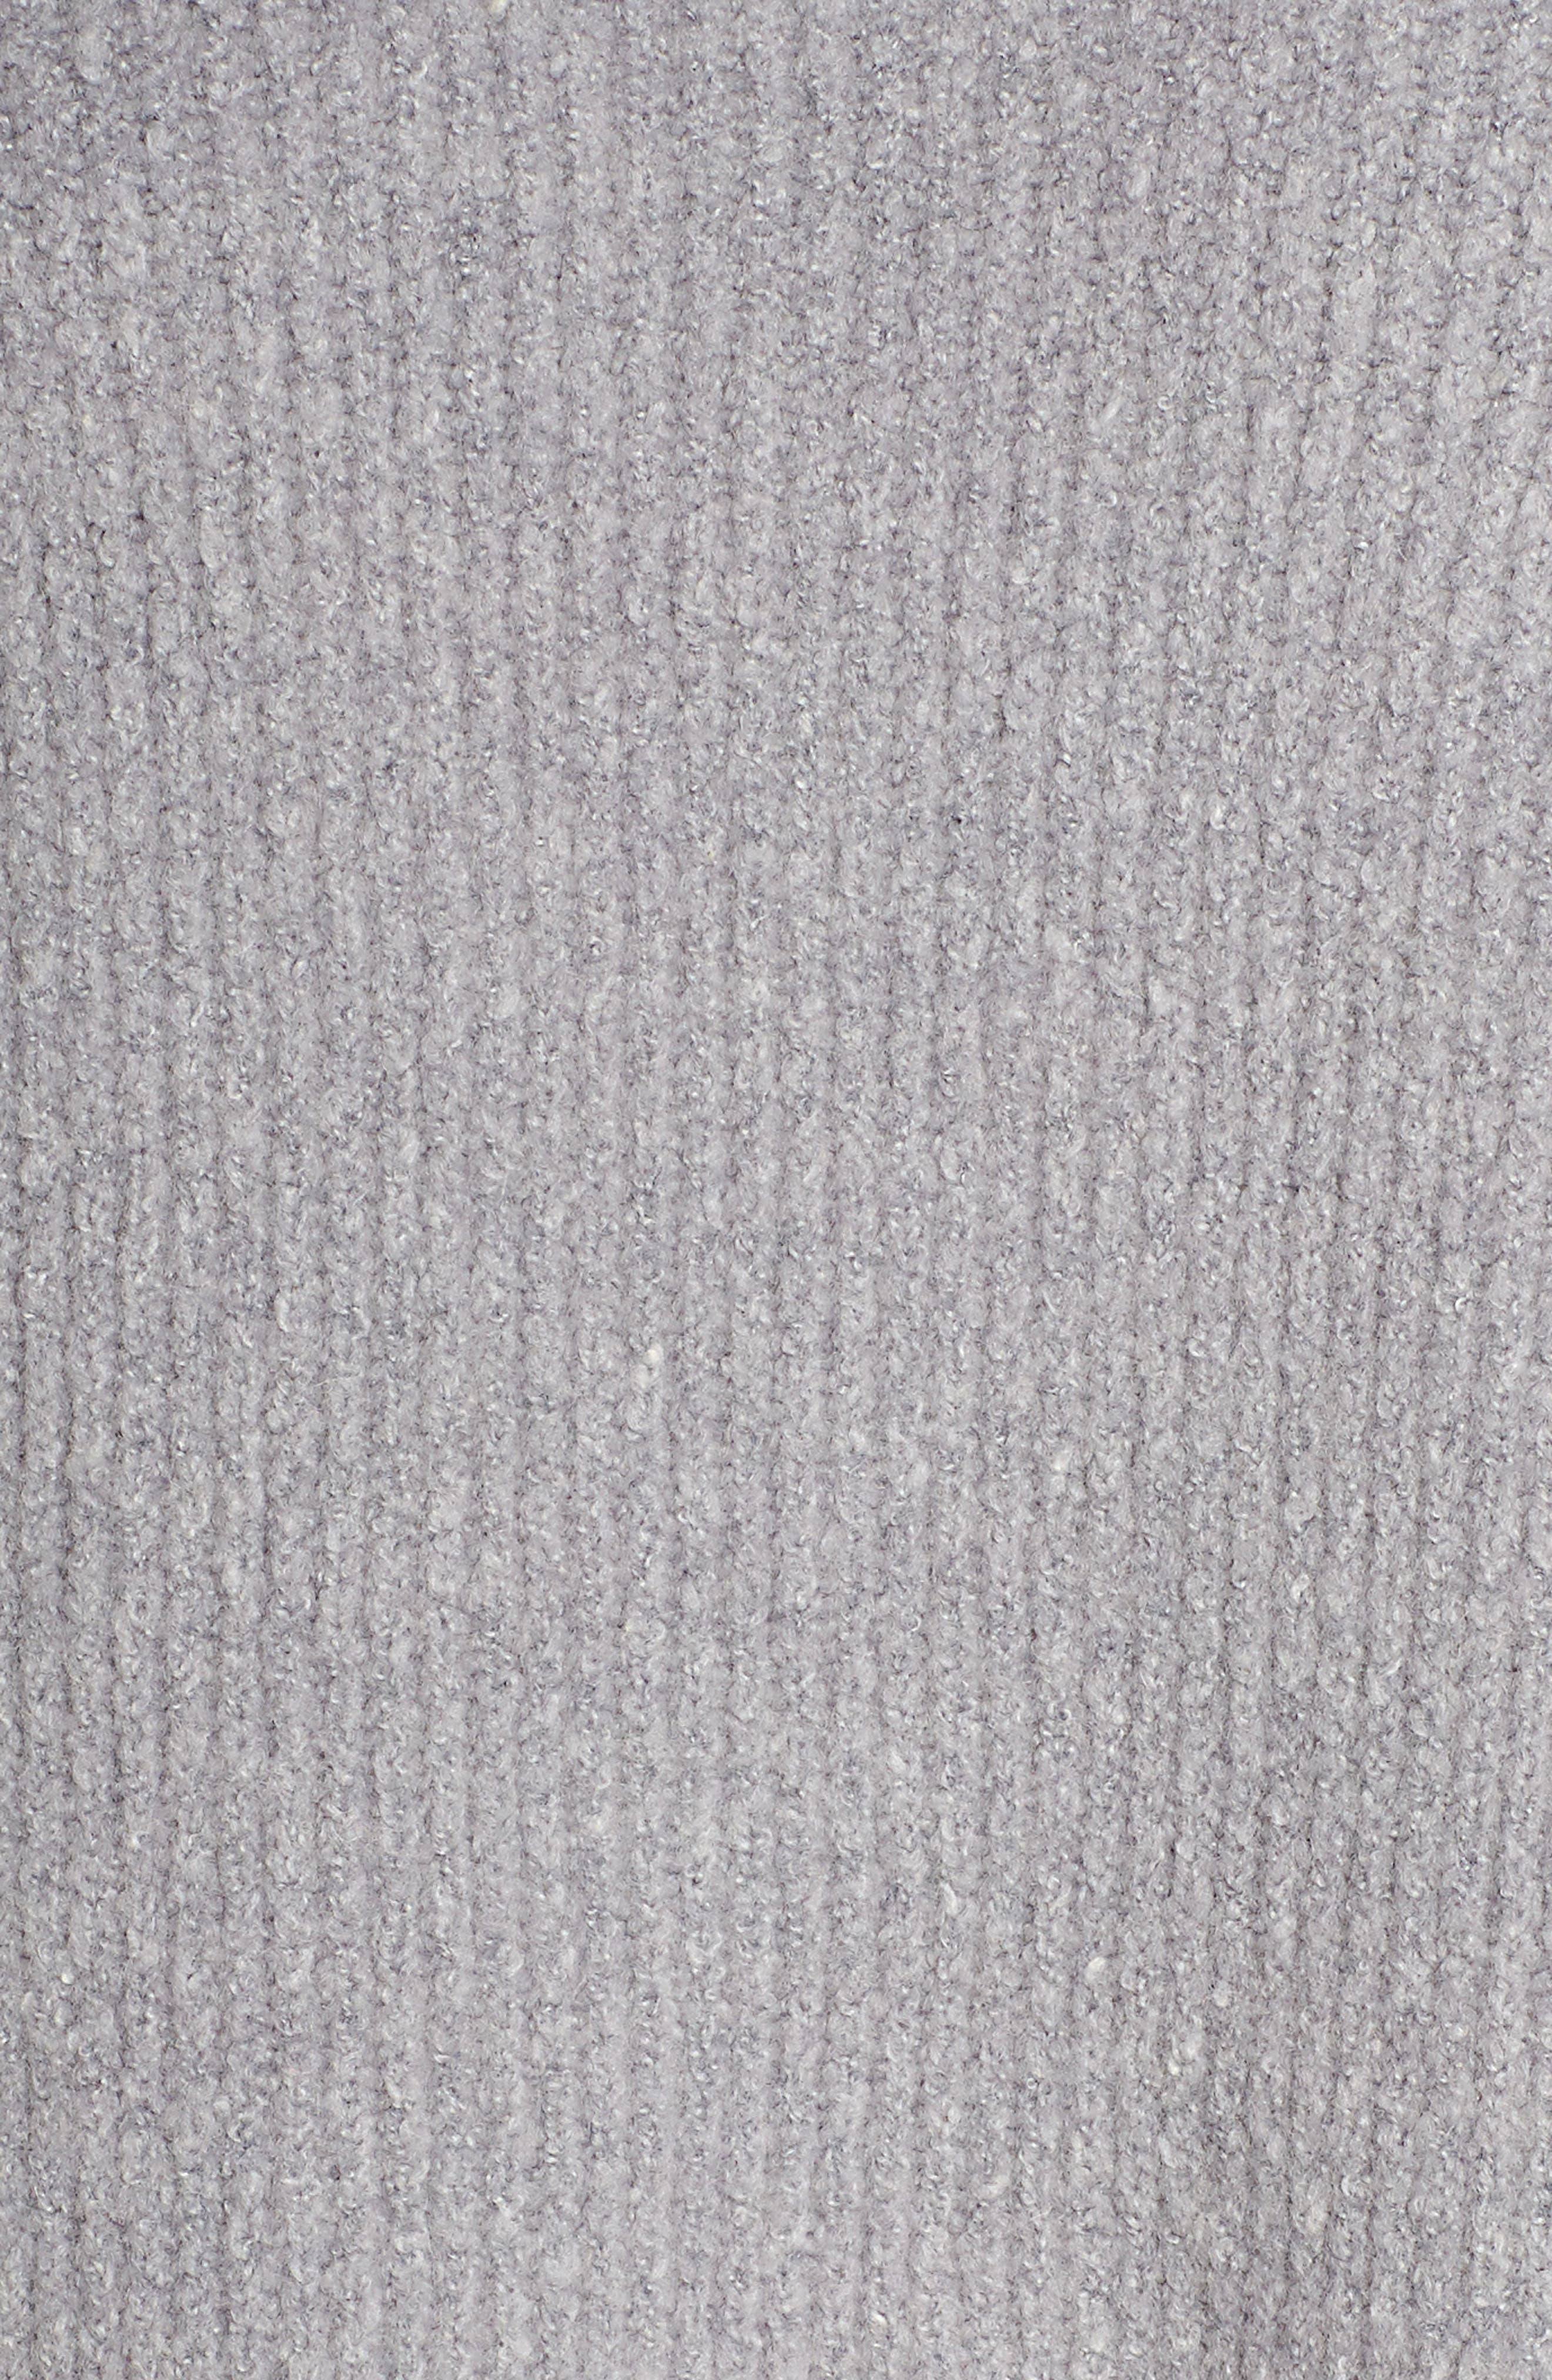 SWEATY BETTY,                             Shakti Oversize Sweater,                             Alternate thumbnail 6, color,                             023